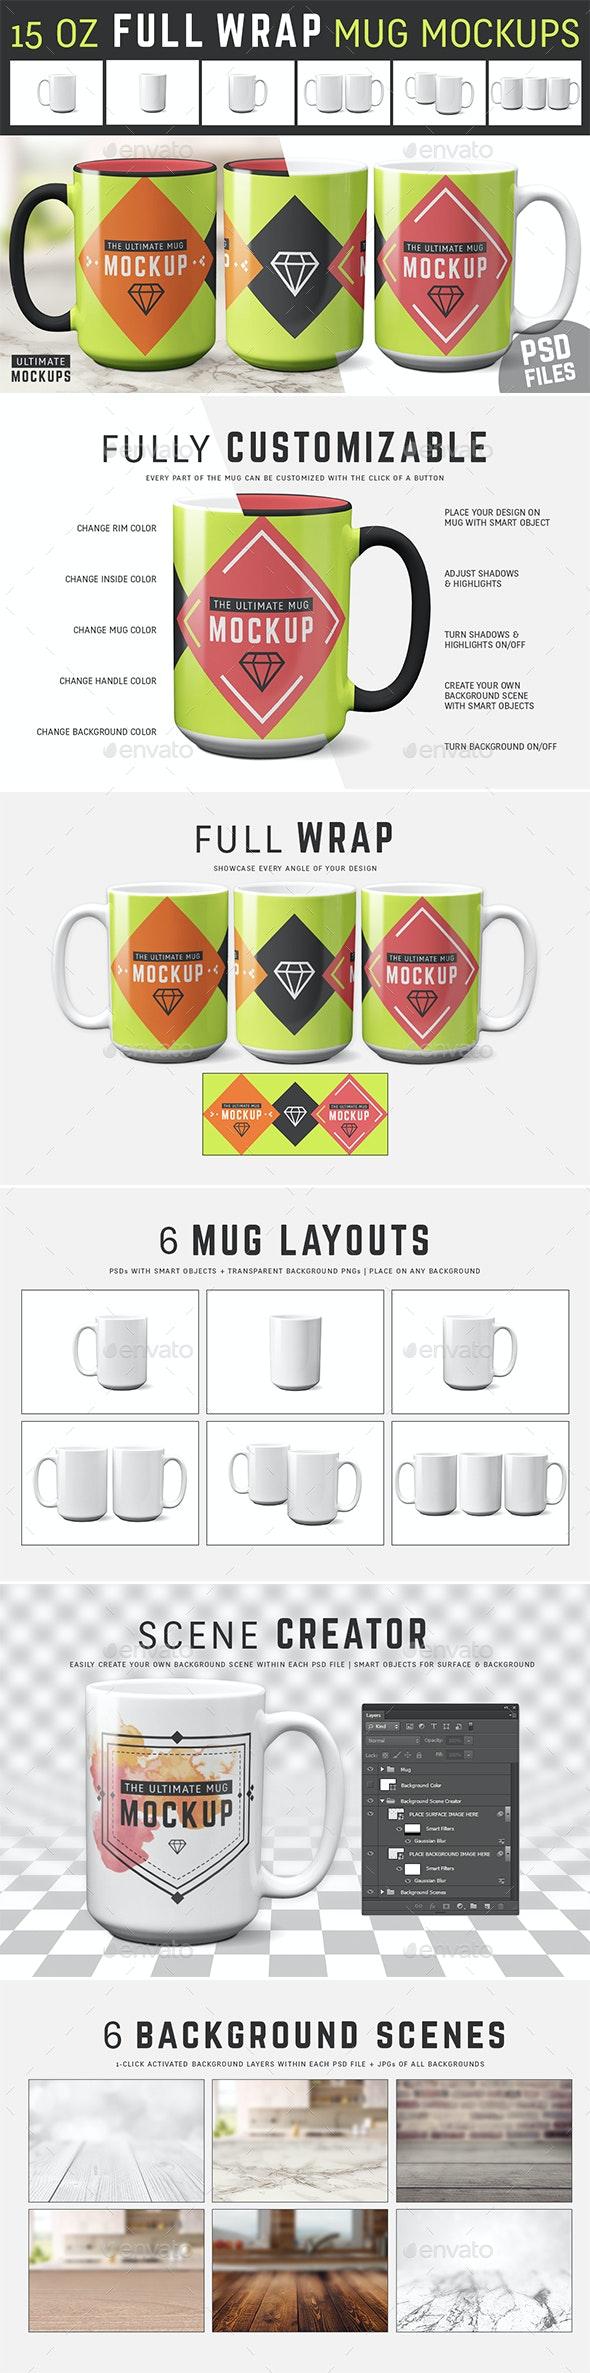 15 oz Full Wrap Mug Mockup Templates - Food and Drink Packaging